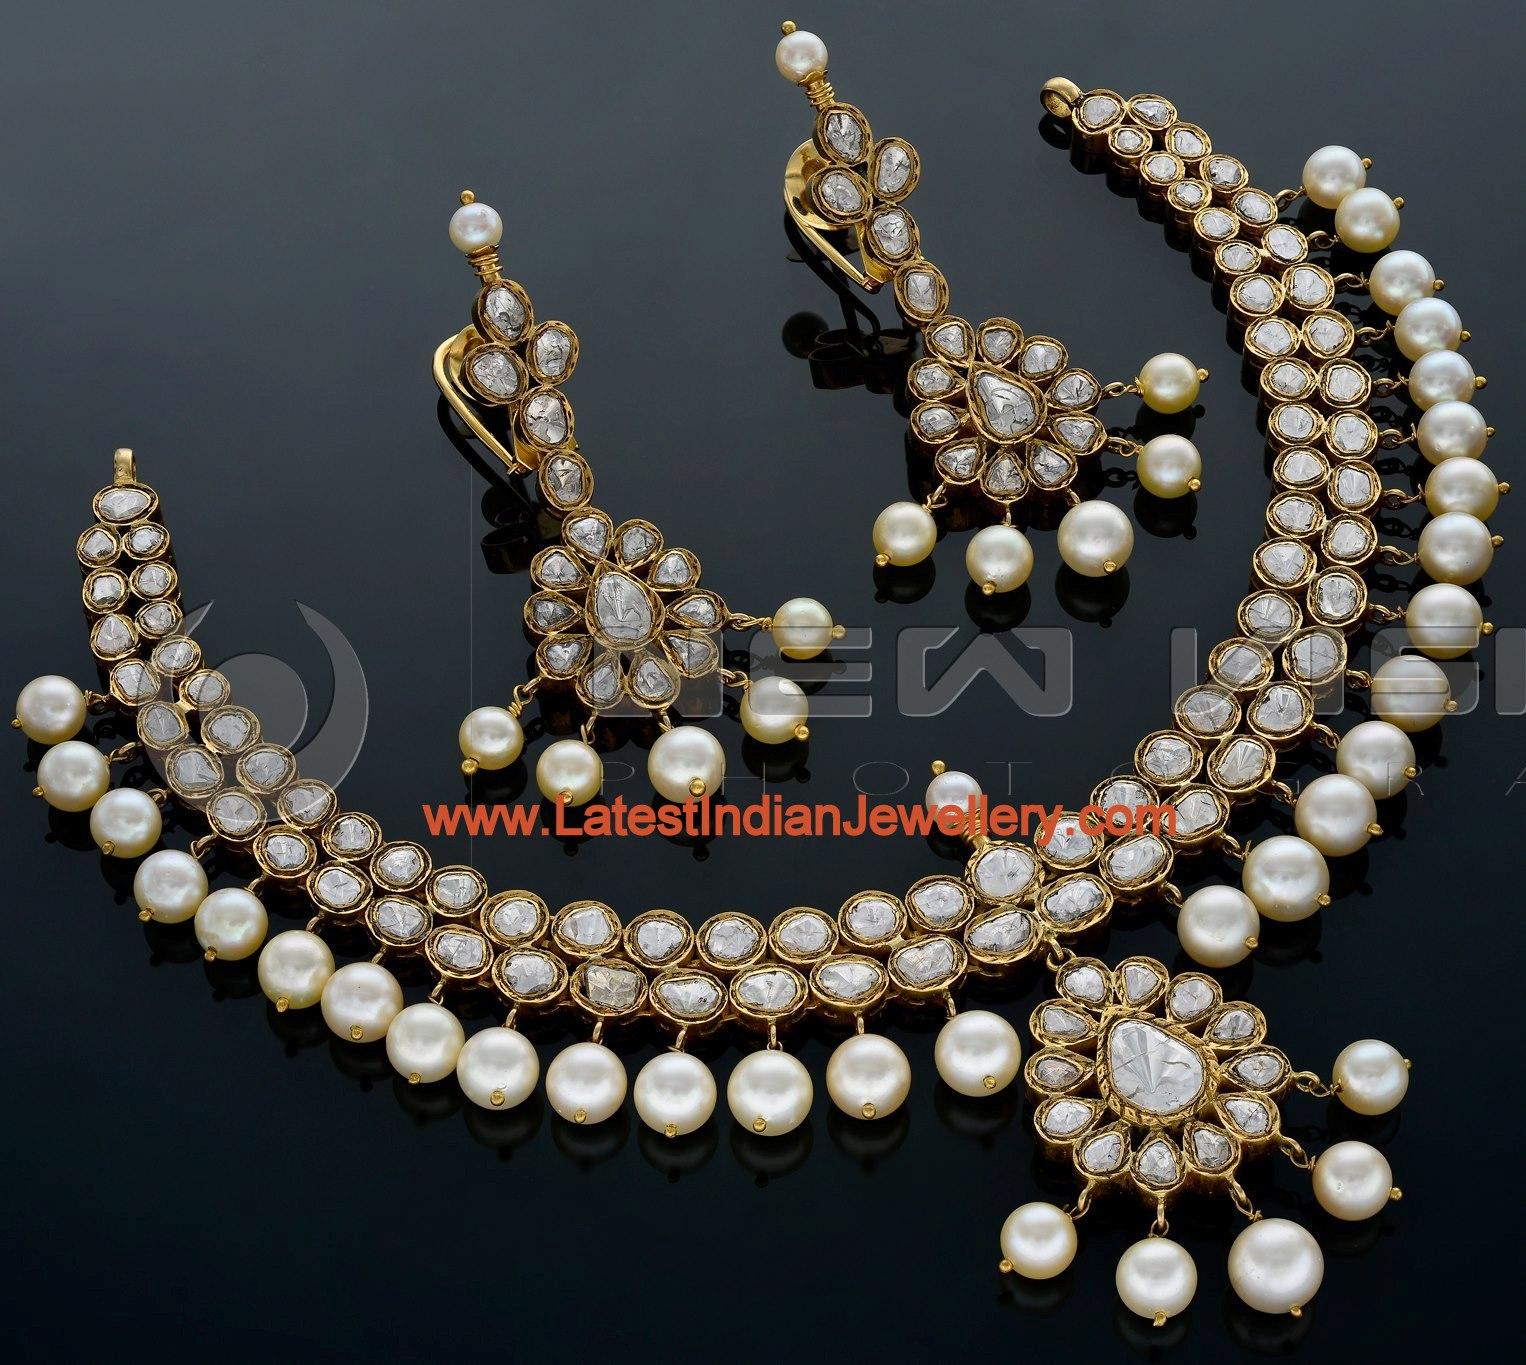 Lovely Polki Diamond Necklace set